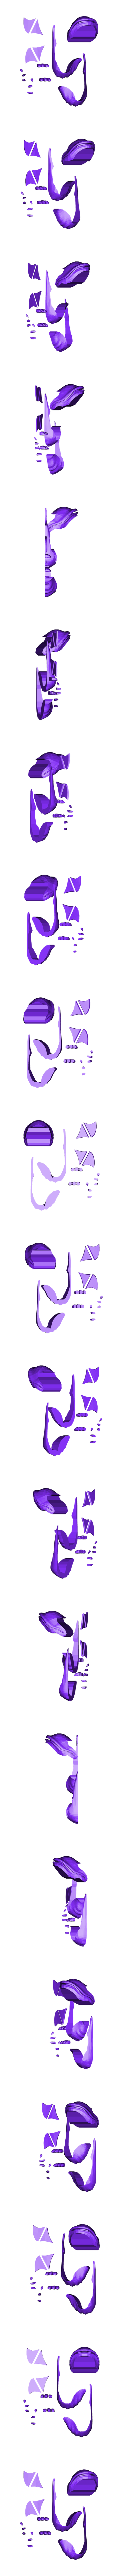 yoshi-violet.STL Download free STL file Dragon bicolor • 3D printer model, proteine